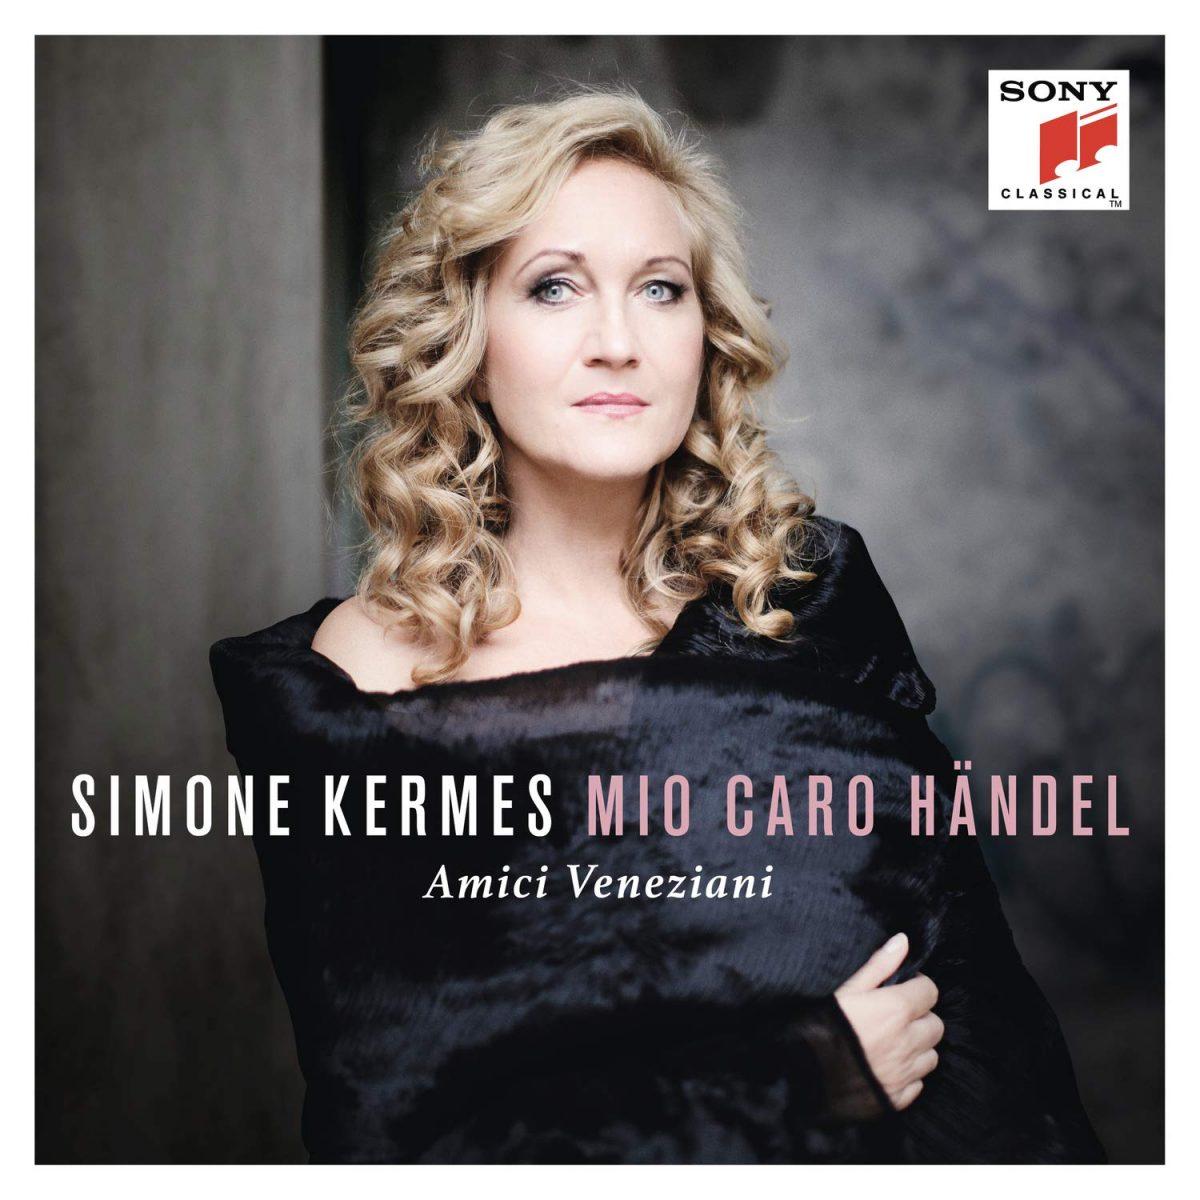 The cover of Mio Caro Handel by Simone Kermes